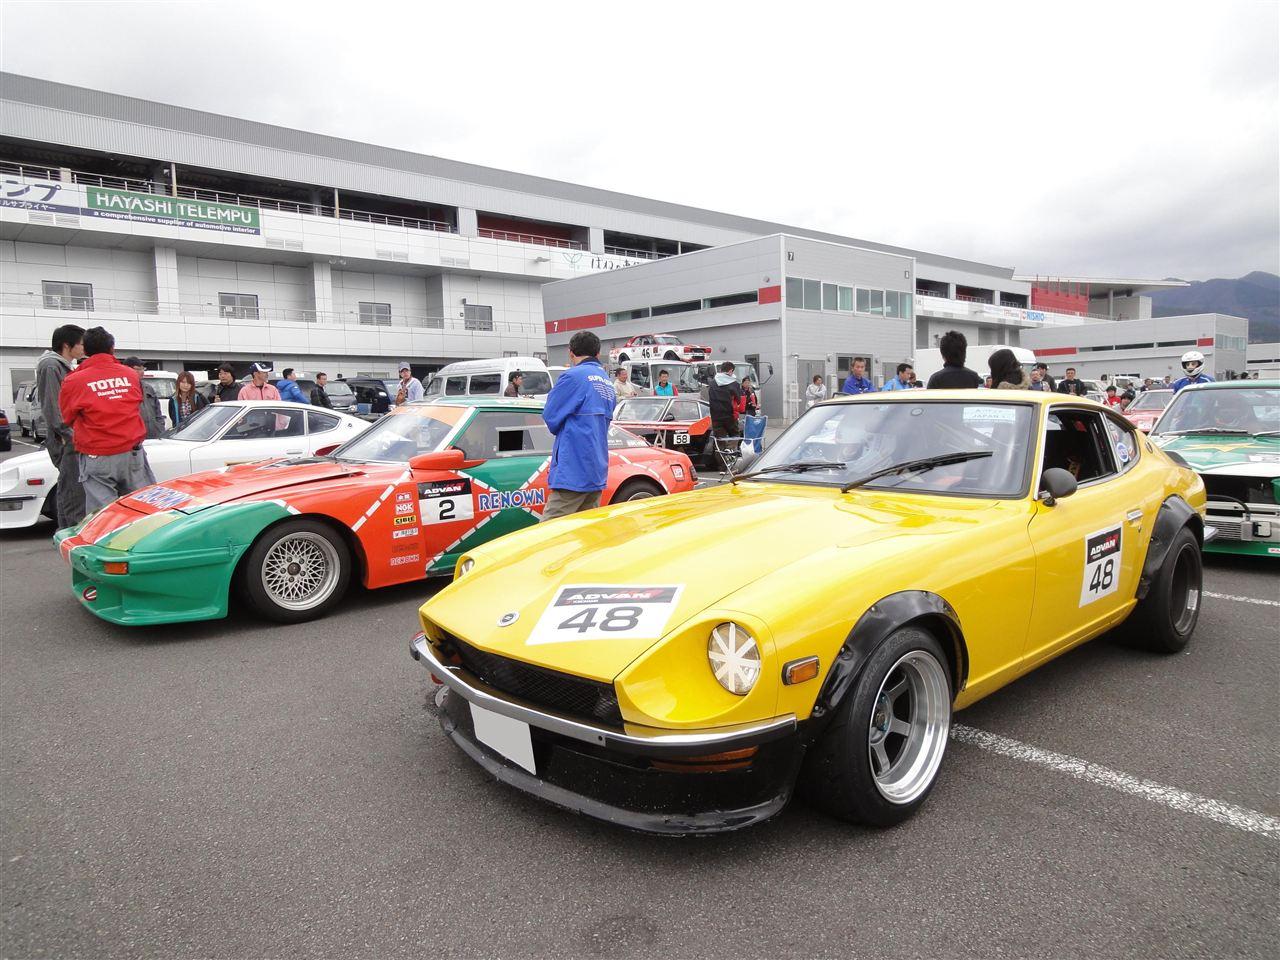 Mazda RX-7 & Nissan Fairlady Z S30